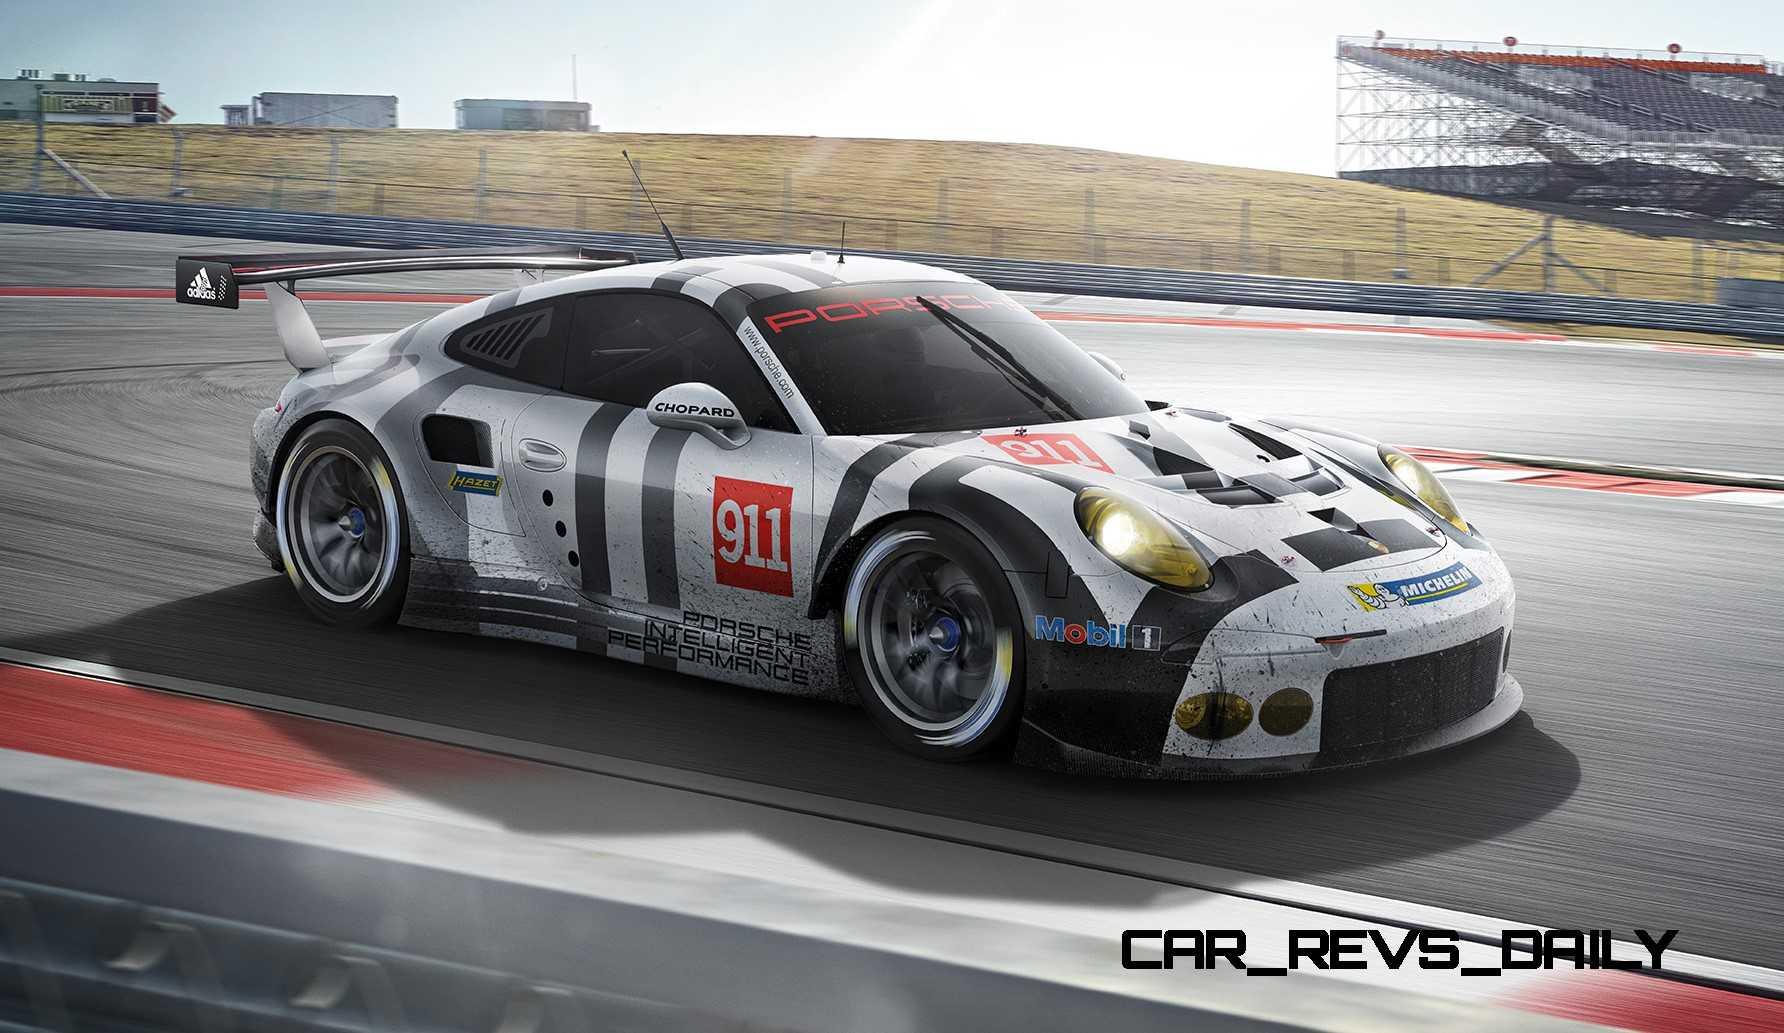 2015 Porsche 911 Gt3 R Vs Gt3 Cup Vs Gt3 Rsr